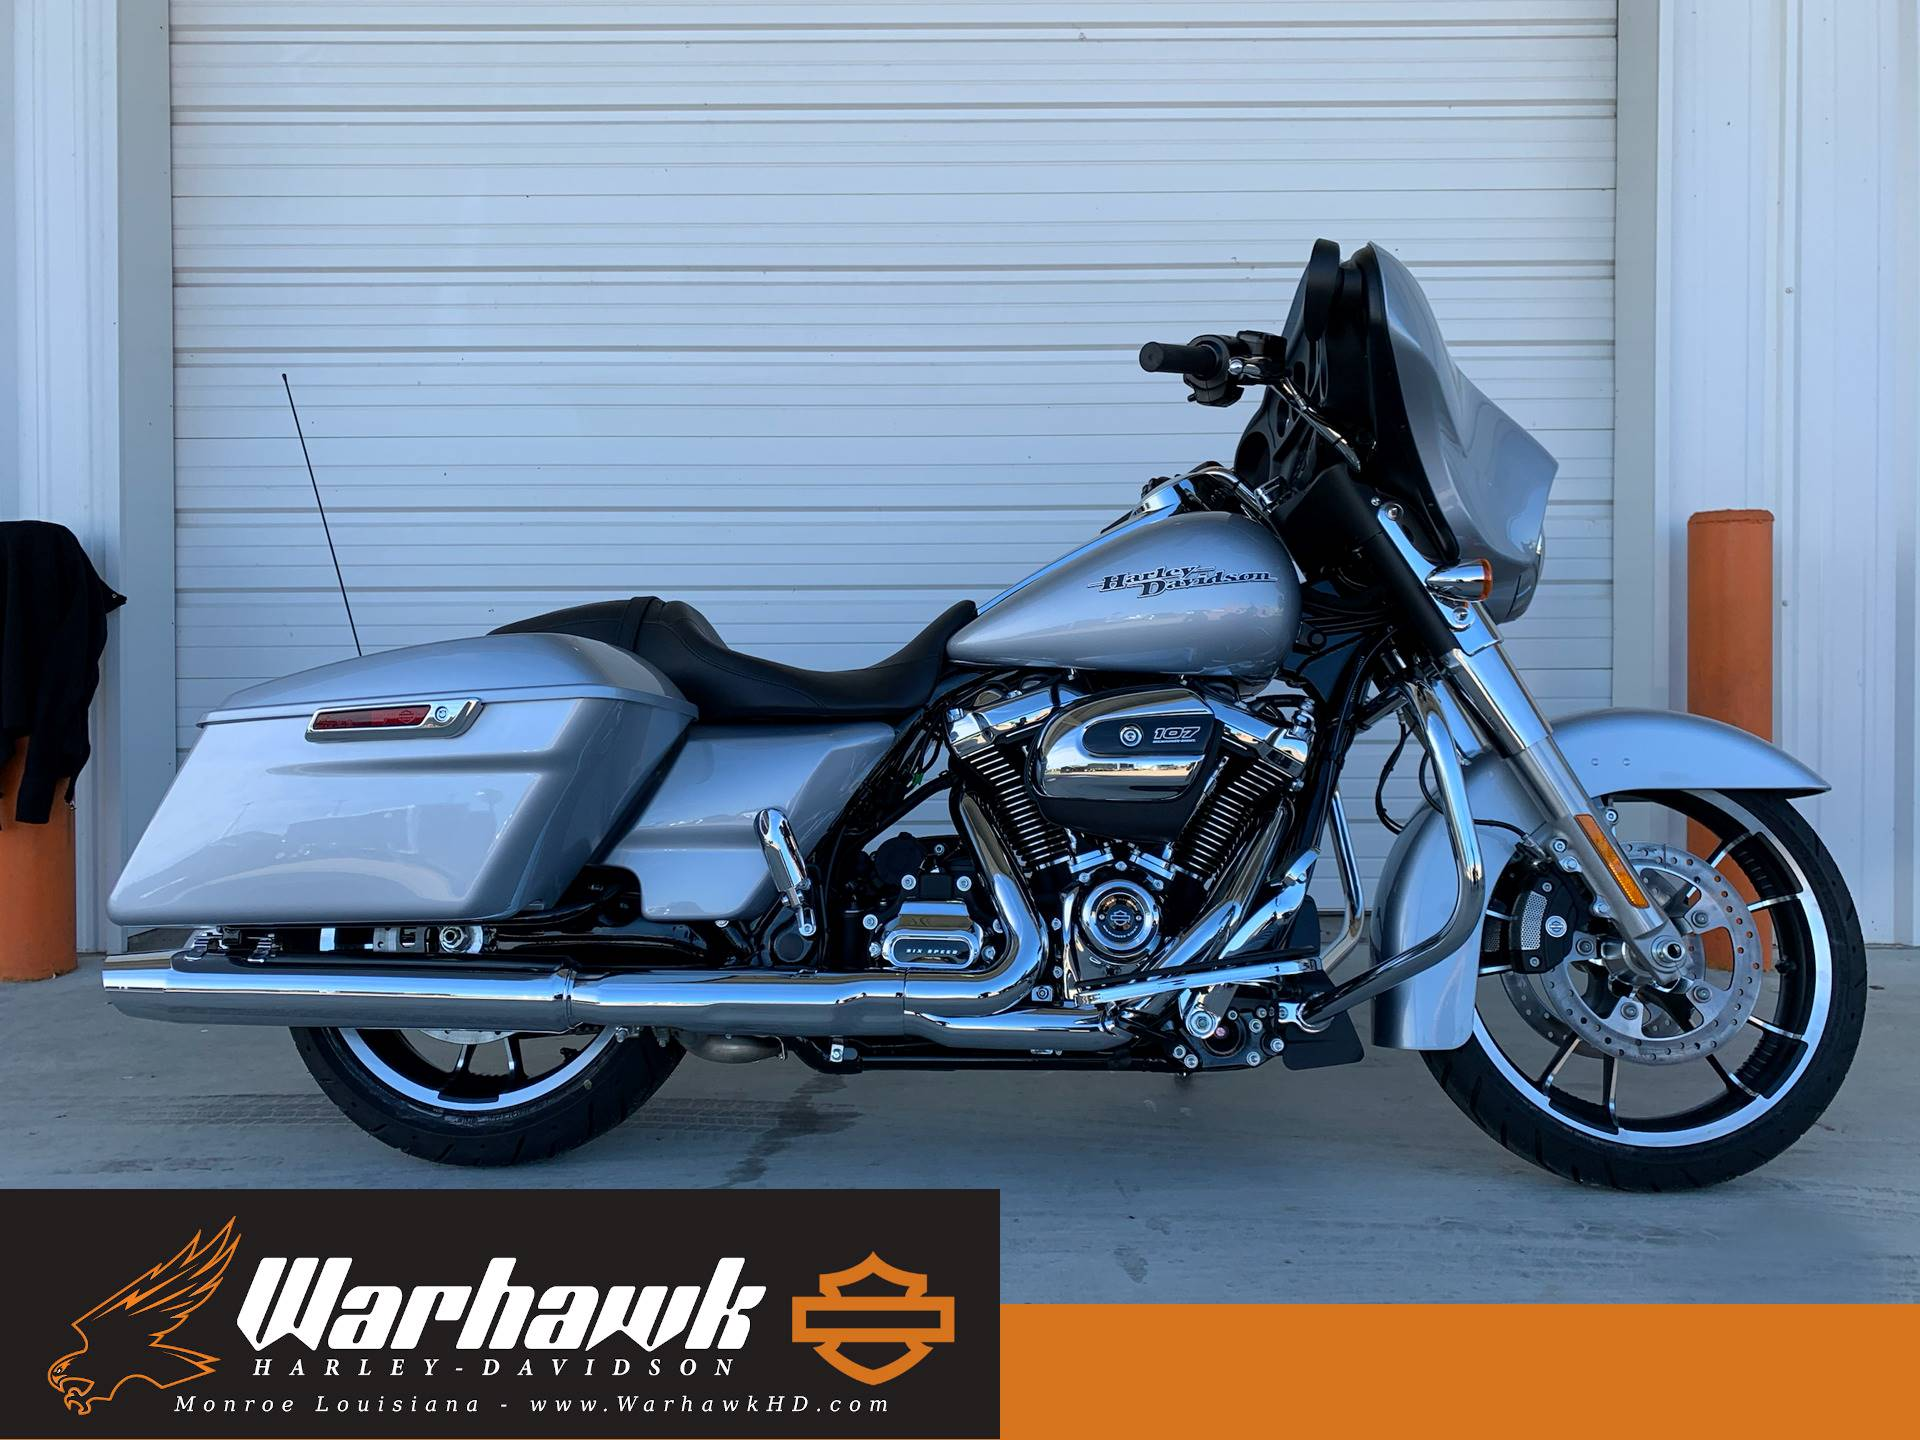 New 2020 Harley Davidson Street Glide Motorcycles In Monroe La